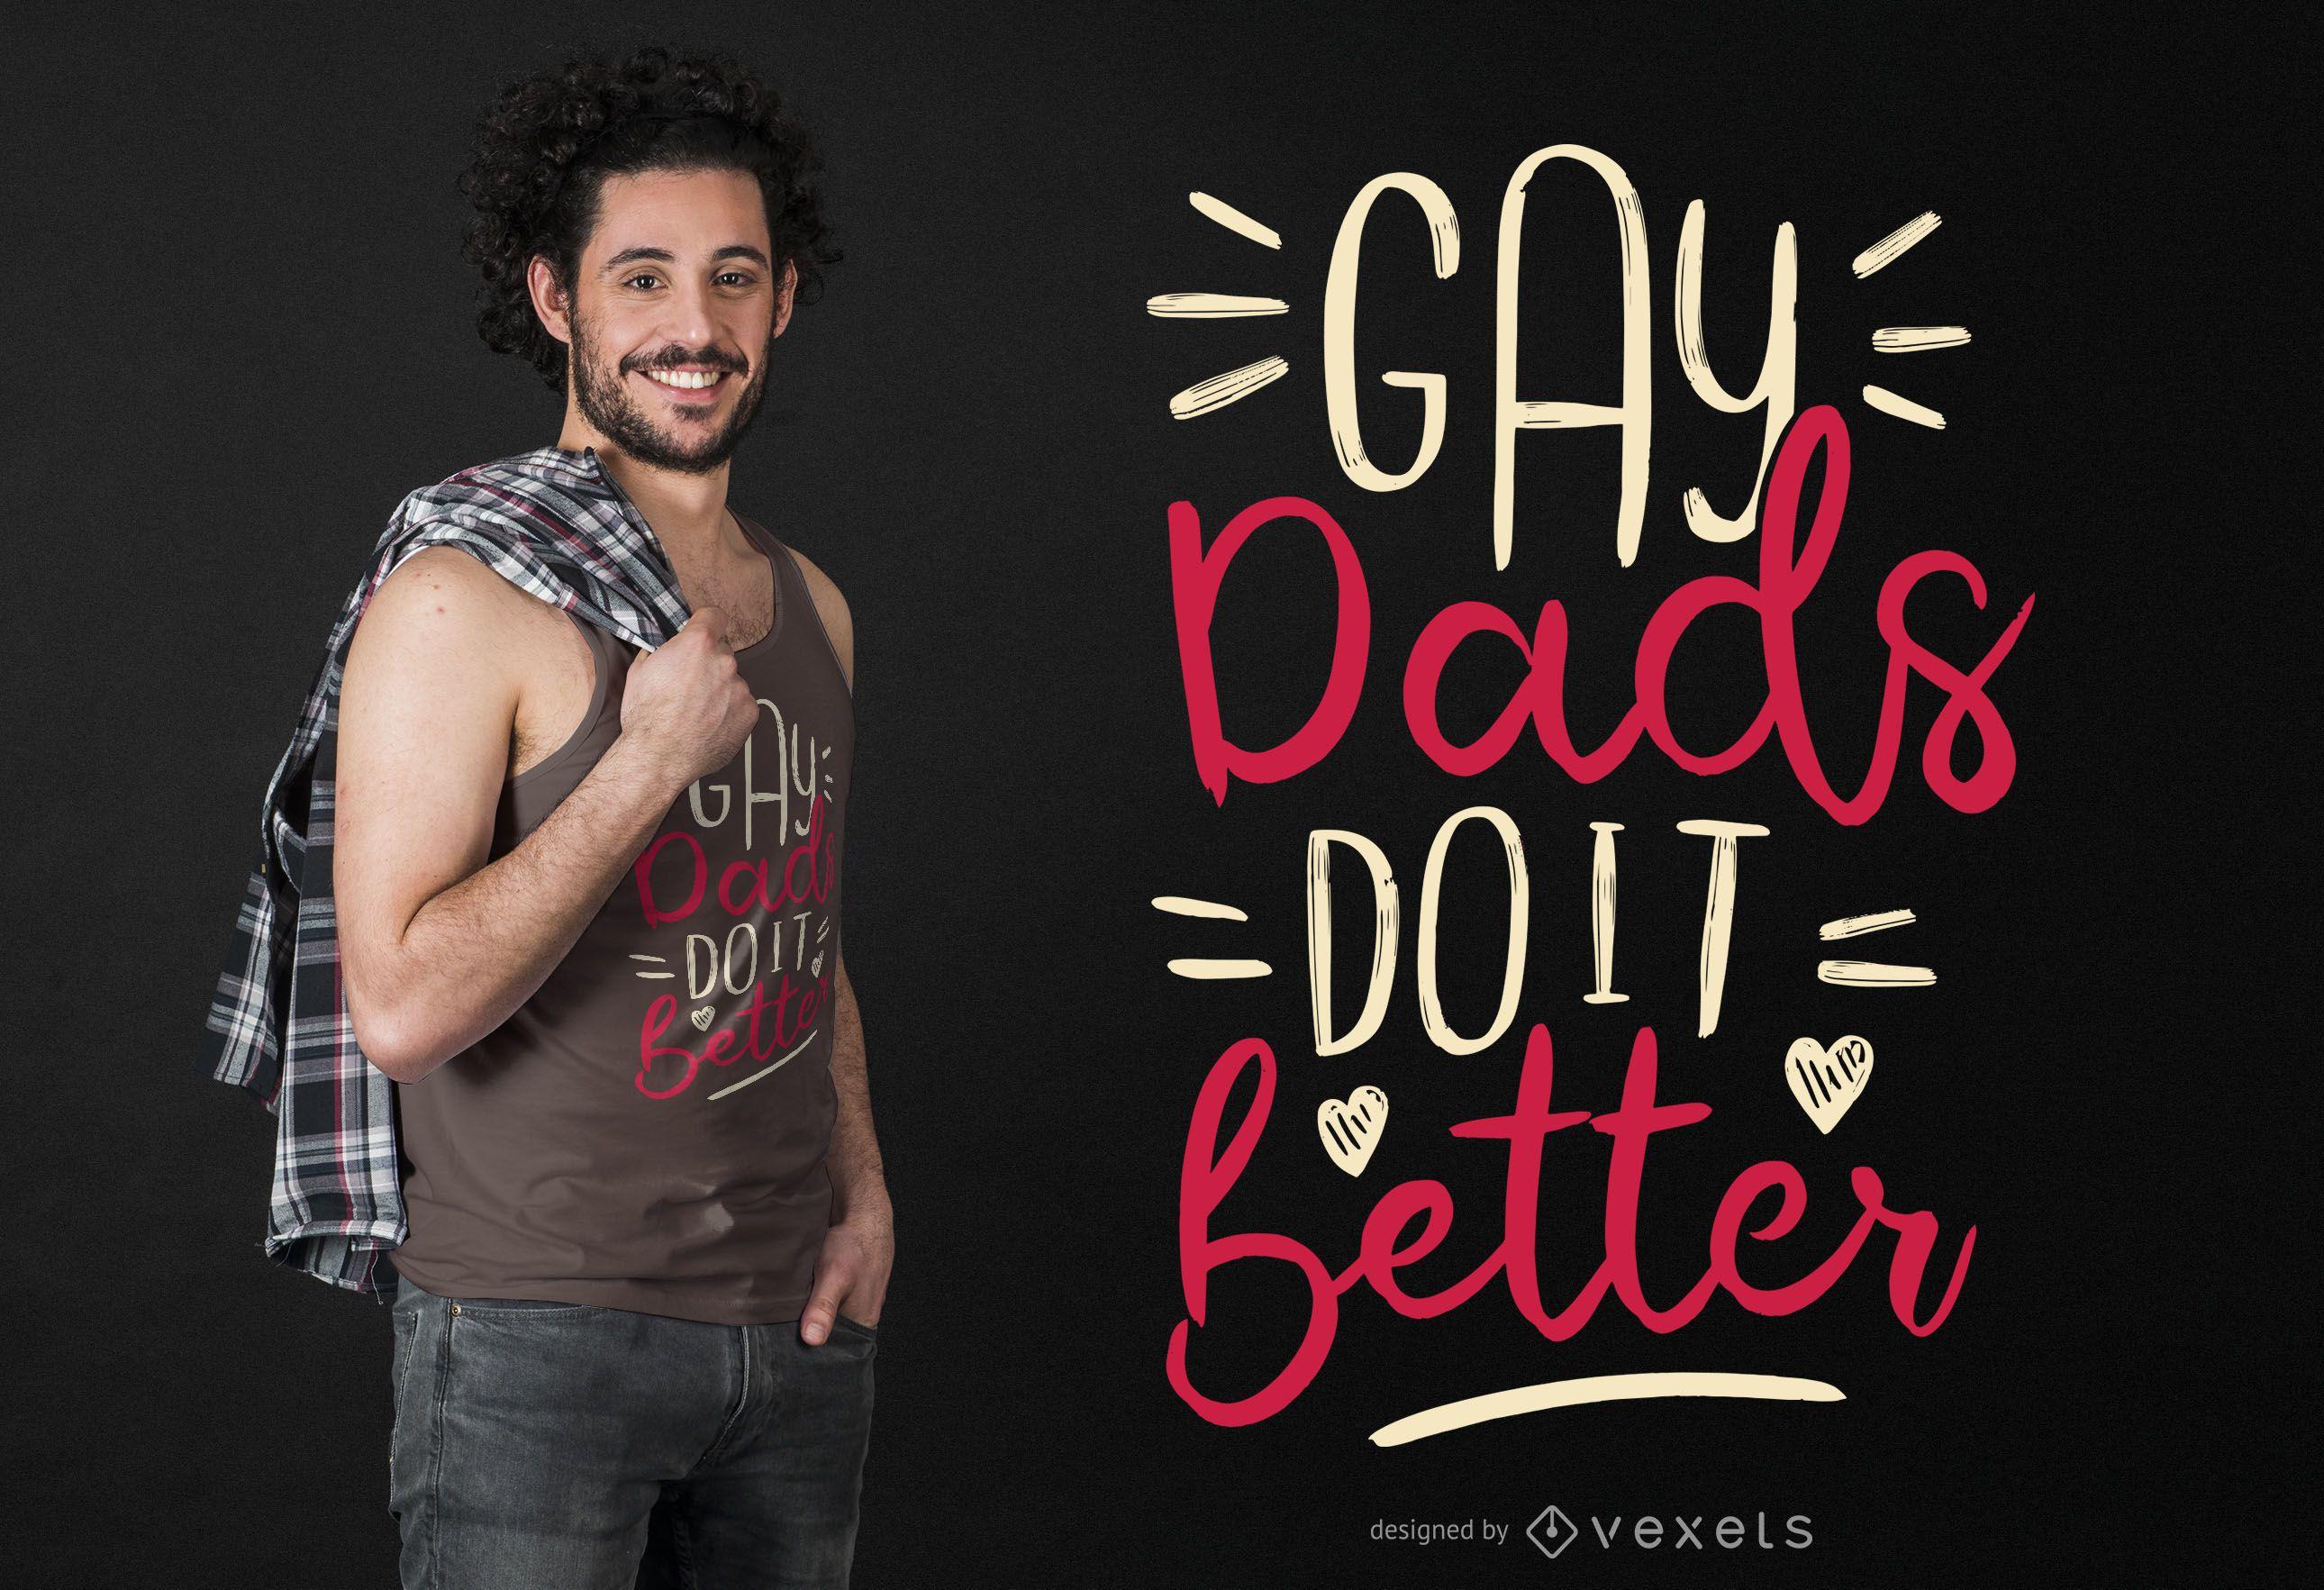 Gay dads t-shirt design